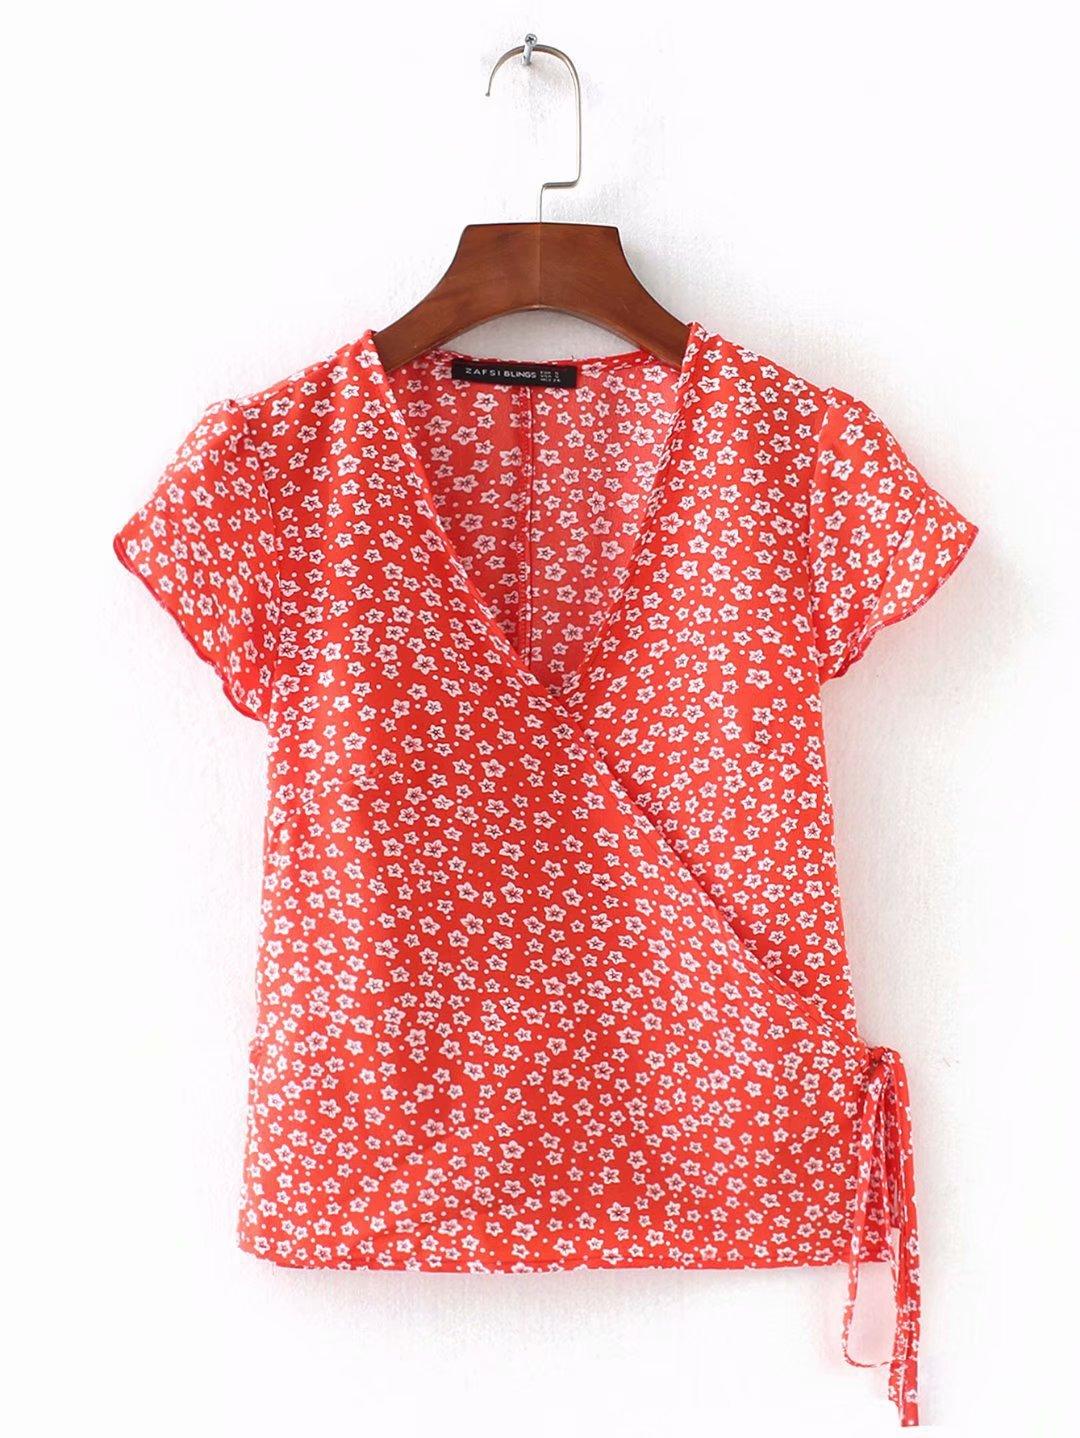 Printed short lace-up shirt NHAM153254